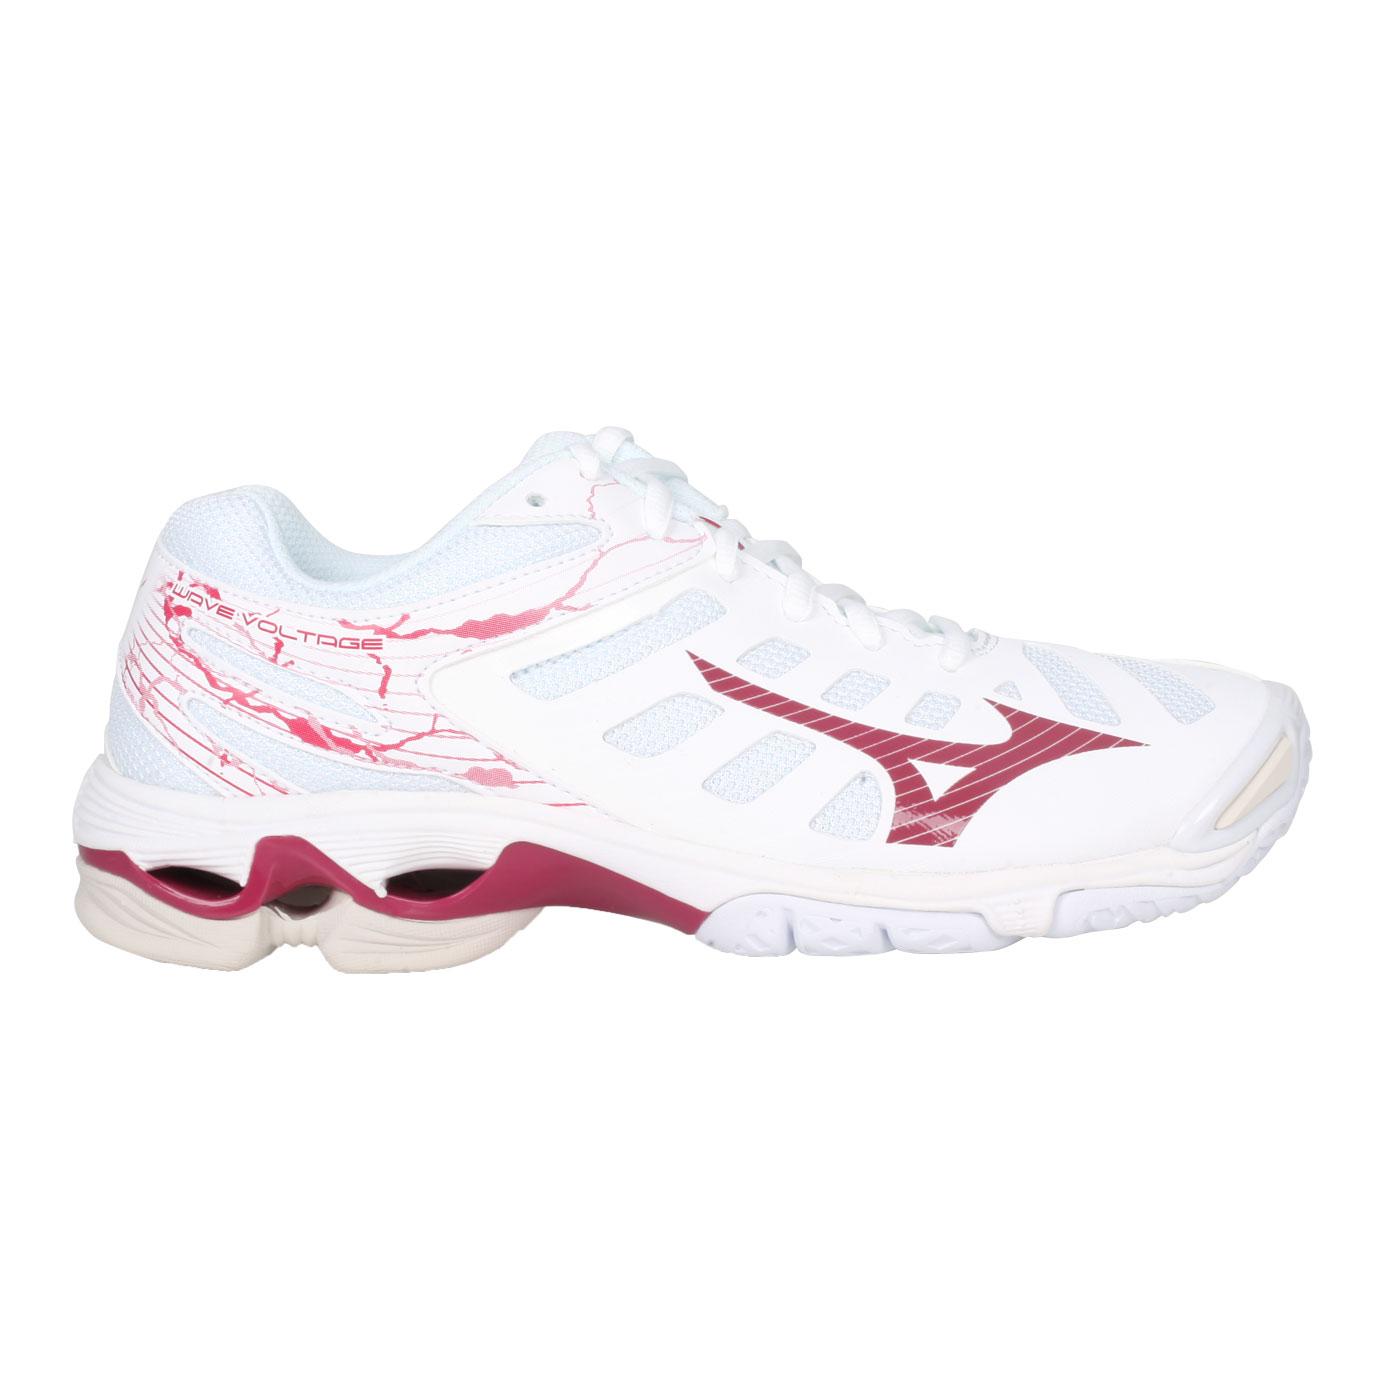 MIZUNO 女款排球鞋  @WAVE VOLTAGE@V1GC216065 - 白紅